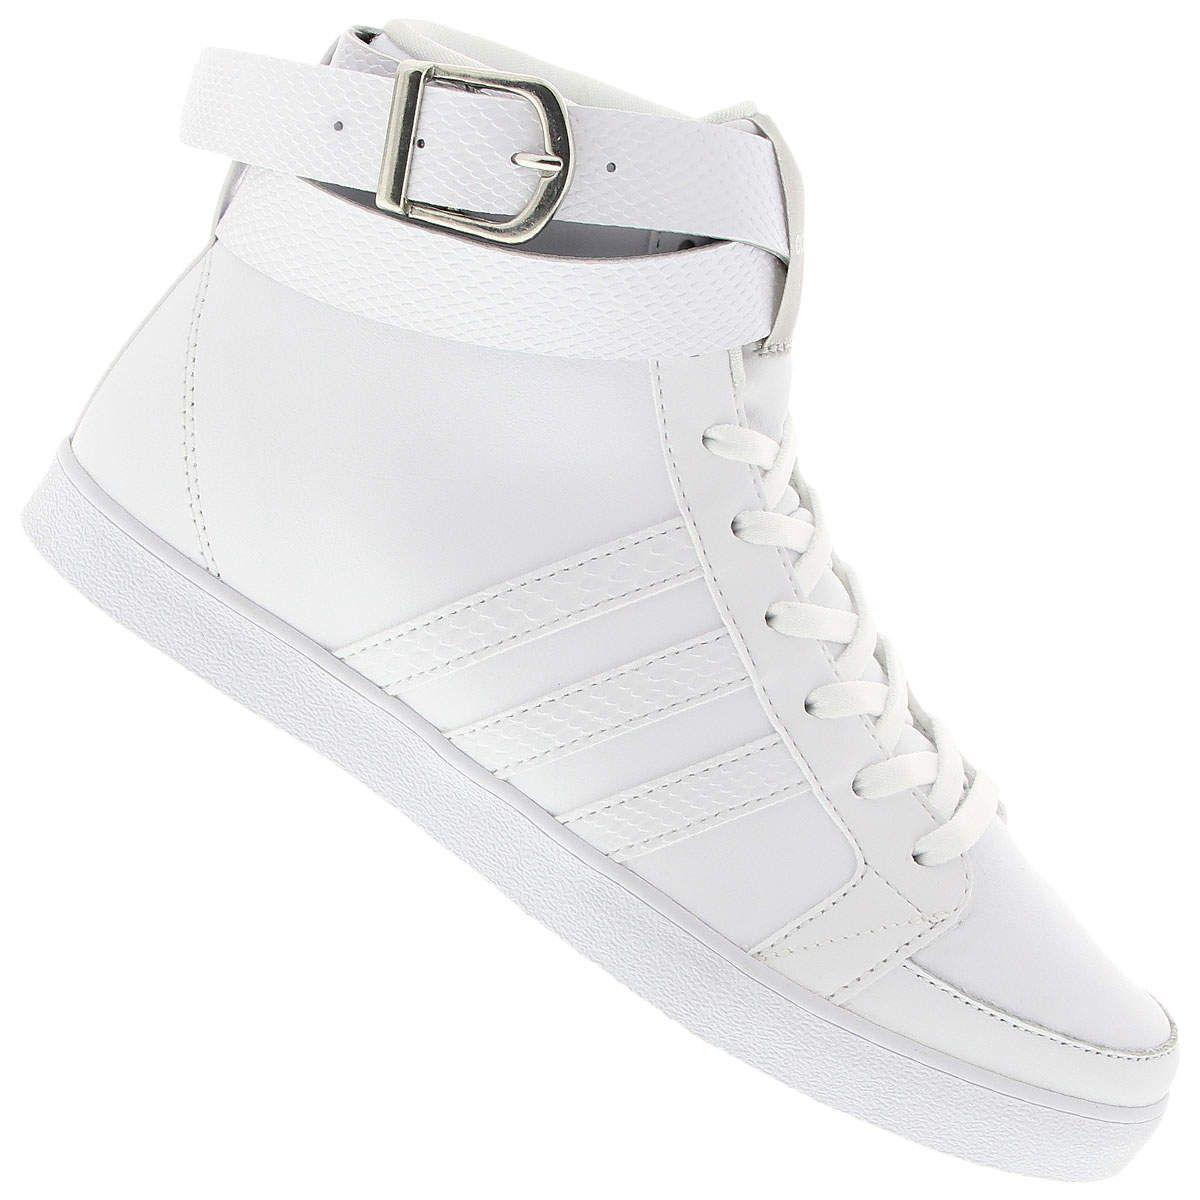 77c6f3cdbf6 tenis-adidas-daily-twist-lx-mid-feminino centauro